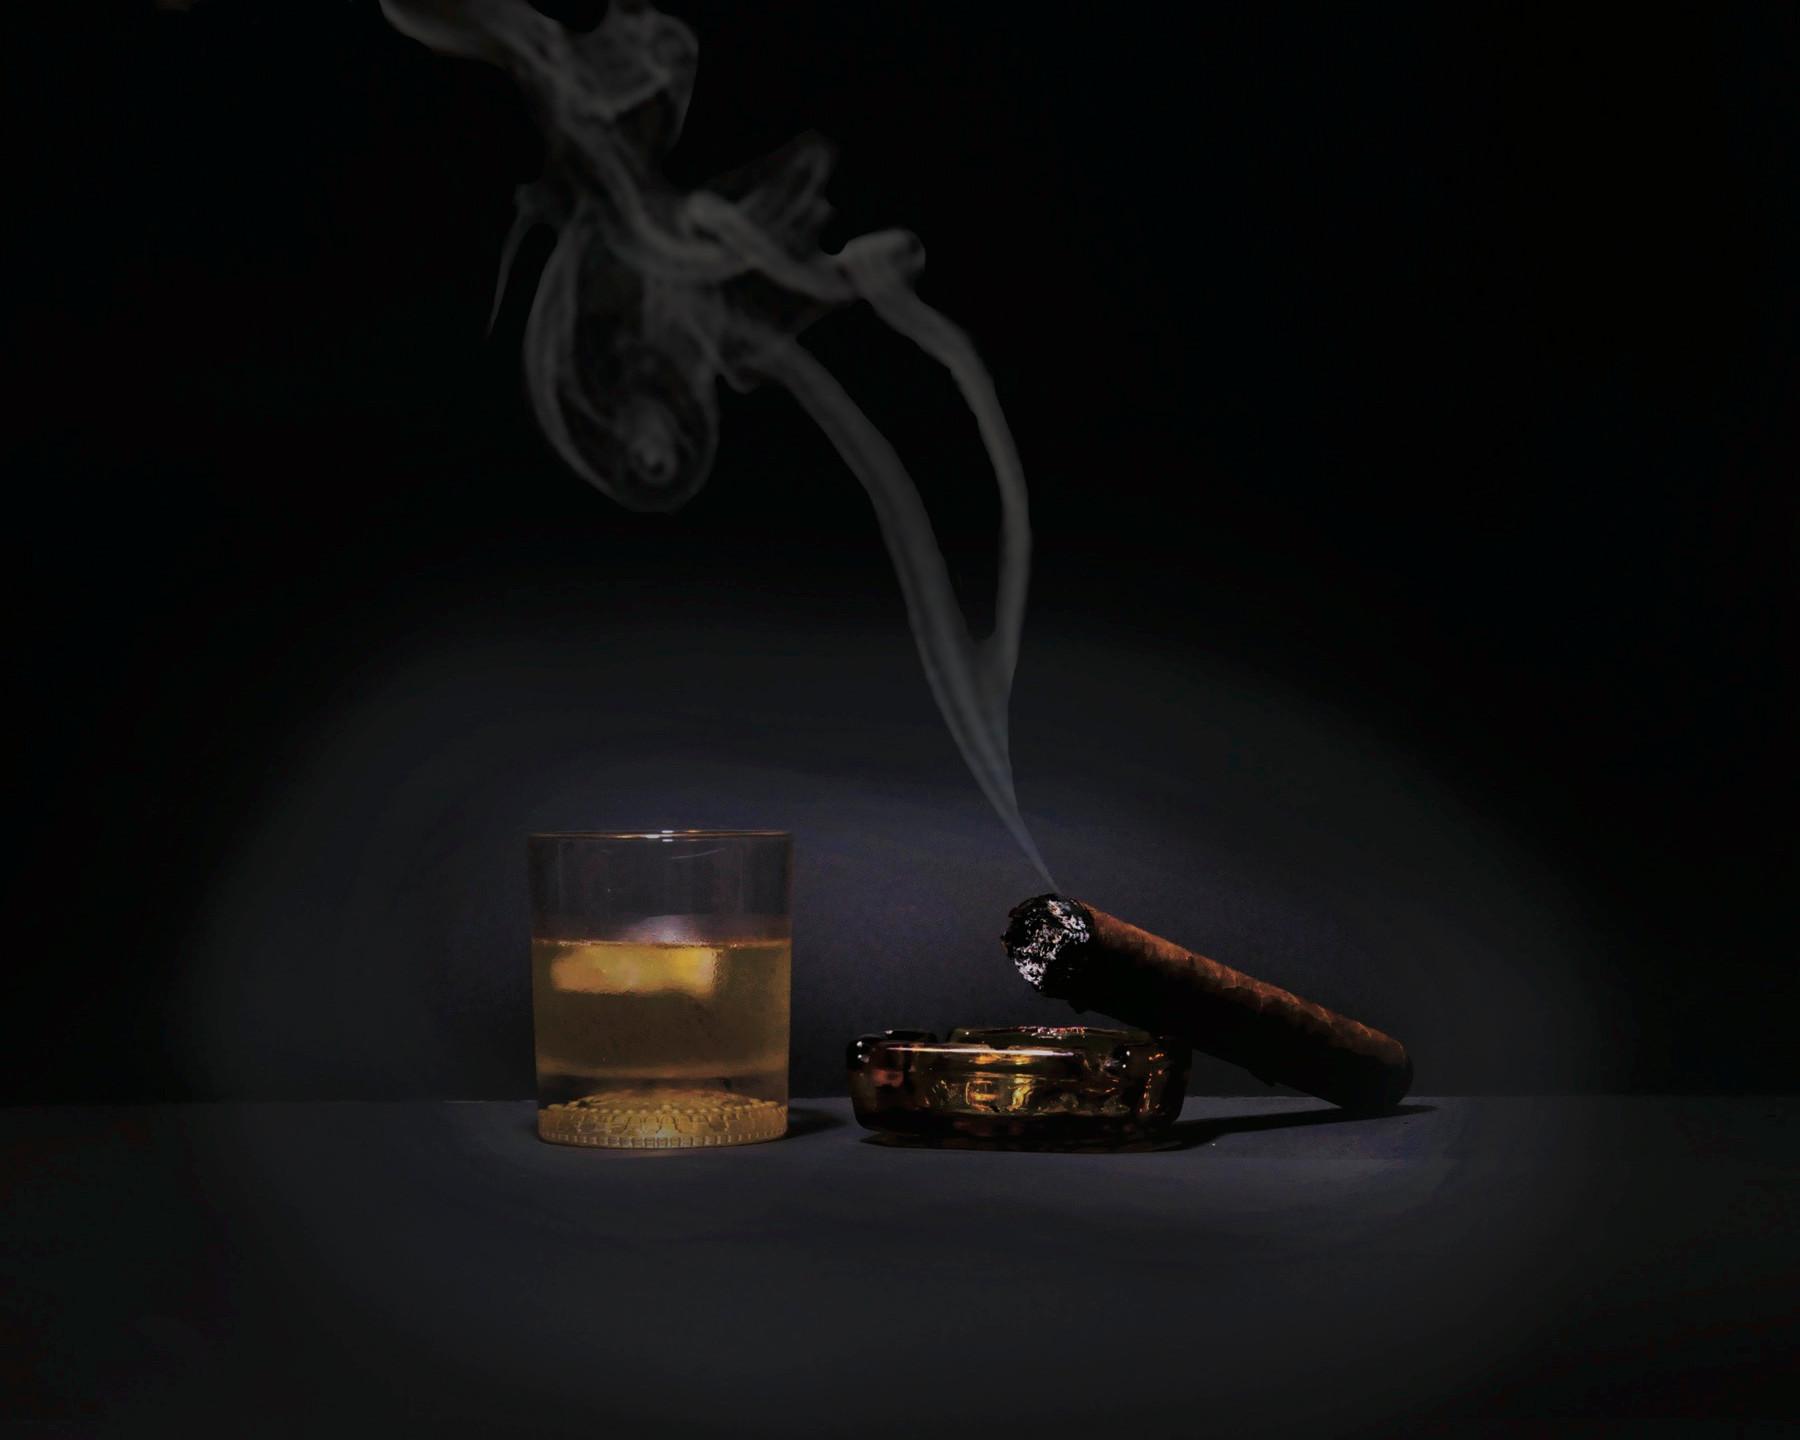 cigarboys_10.22_